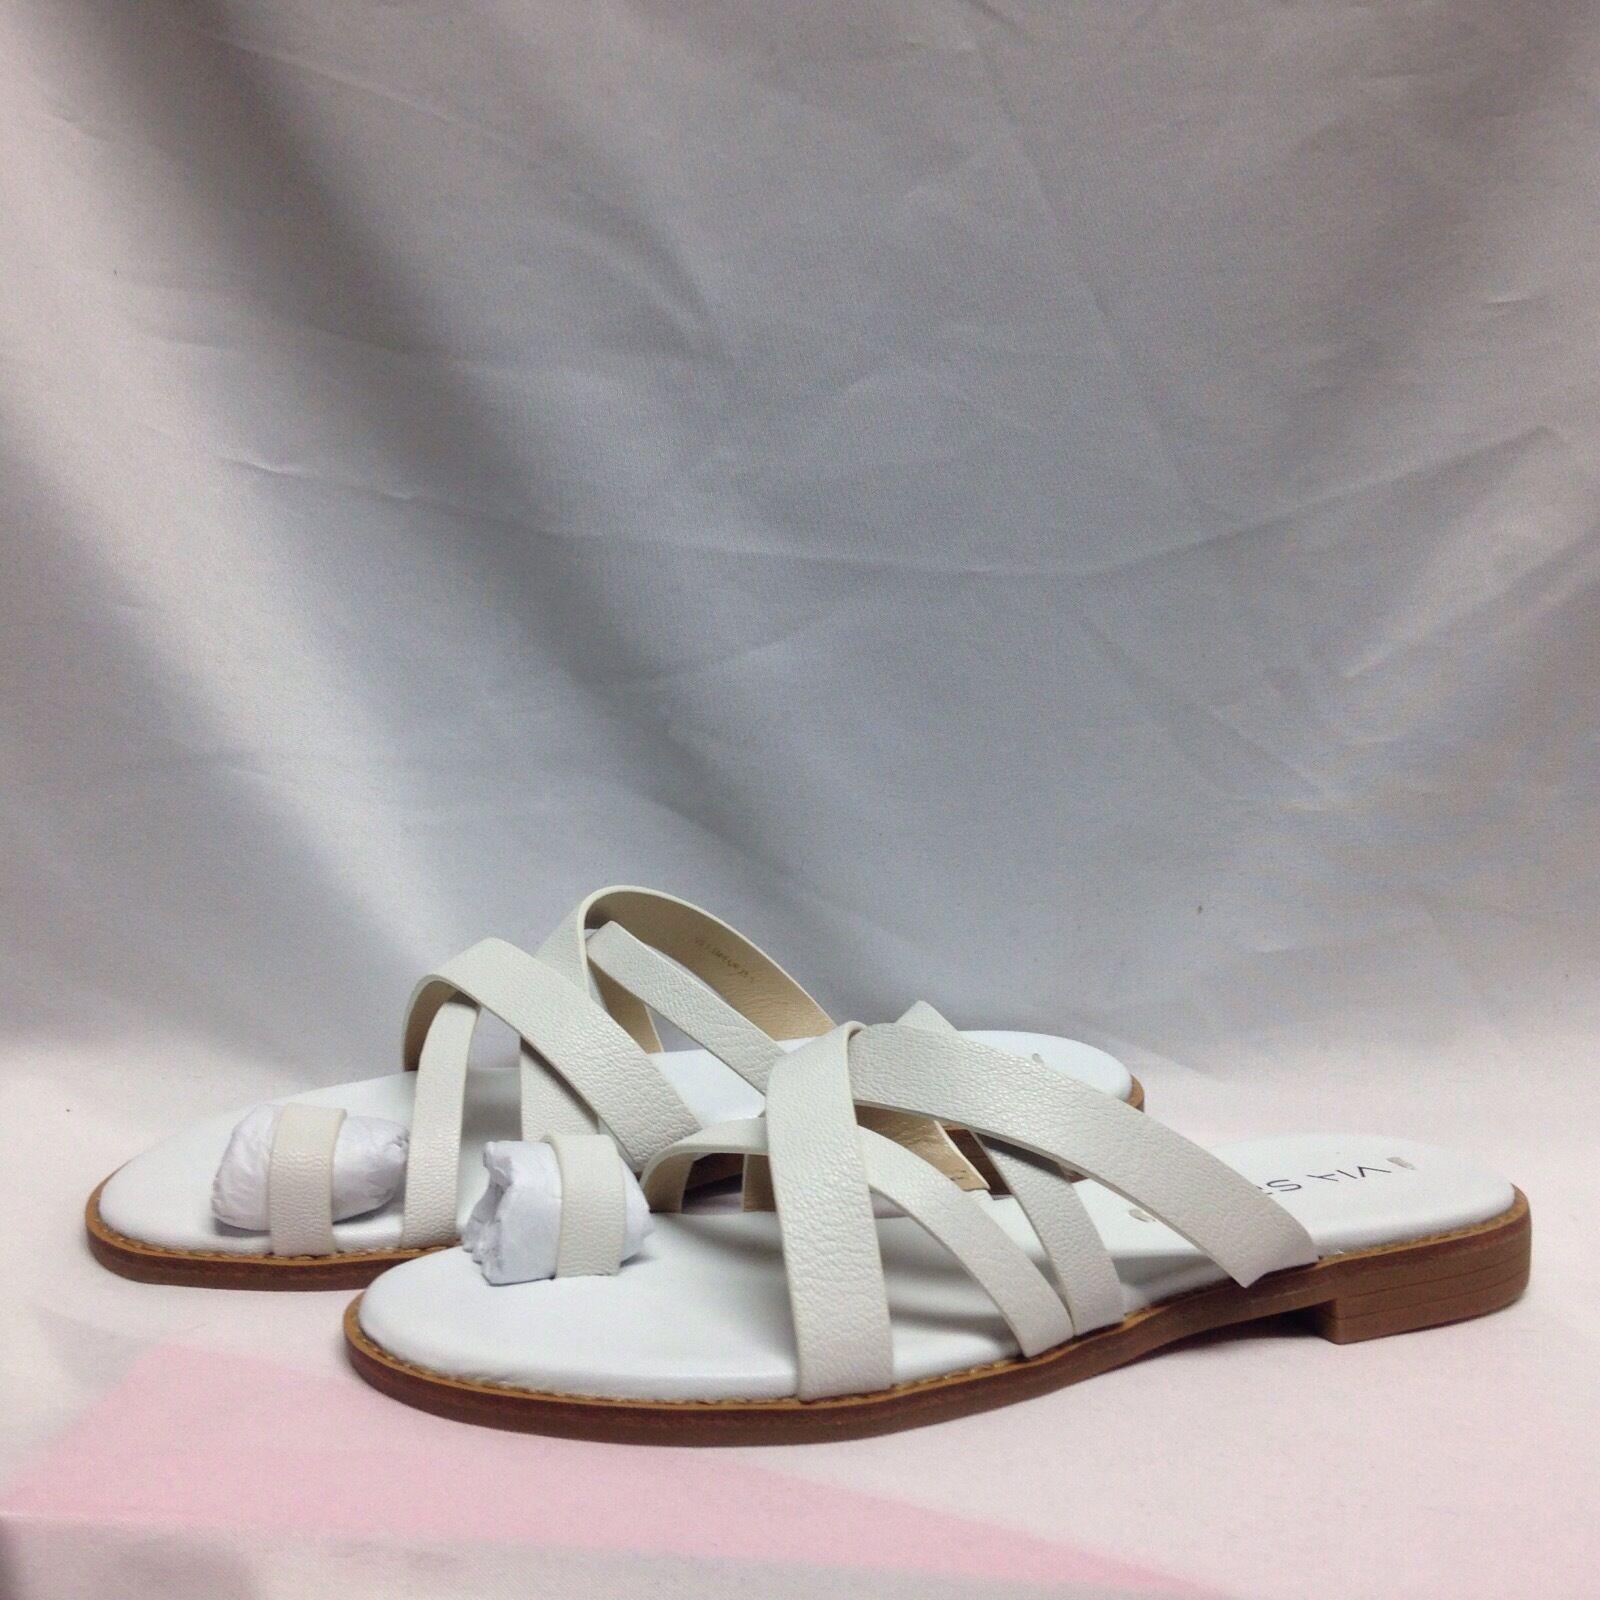 Via Spiga Reese2 Toe Ring Flip Flop Sandal 5.5 M White Leather New w Box